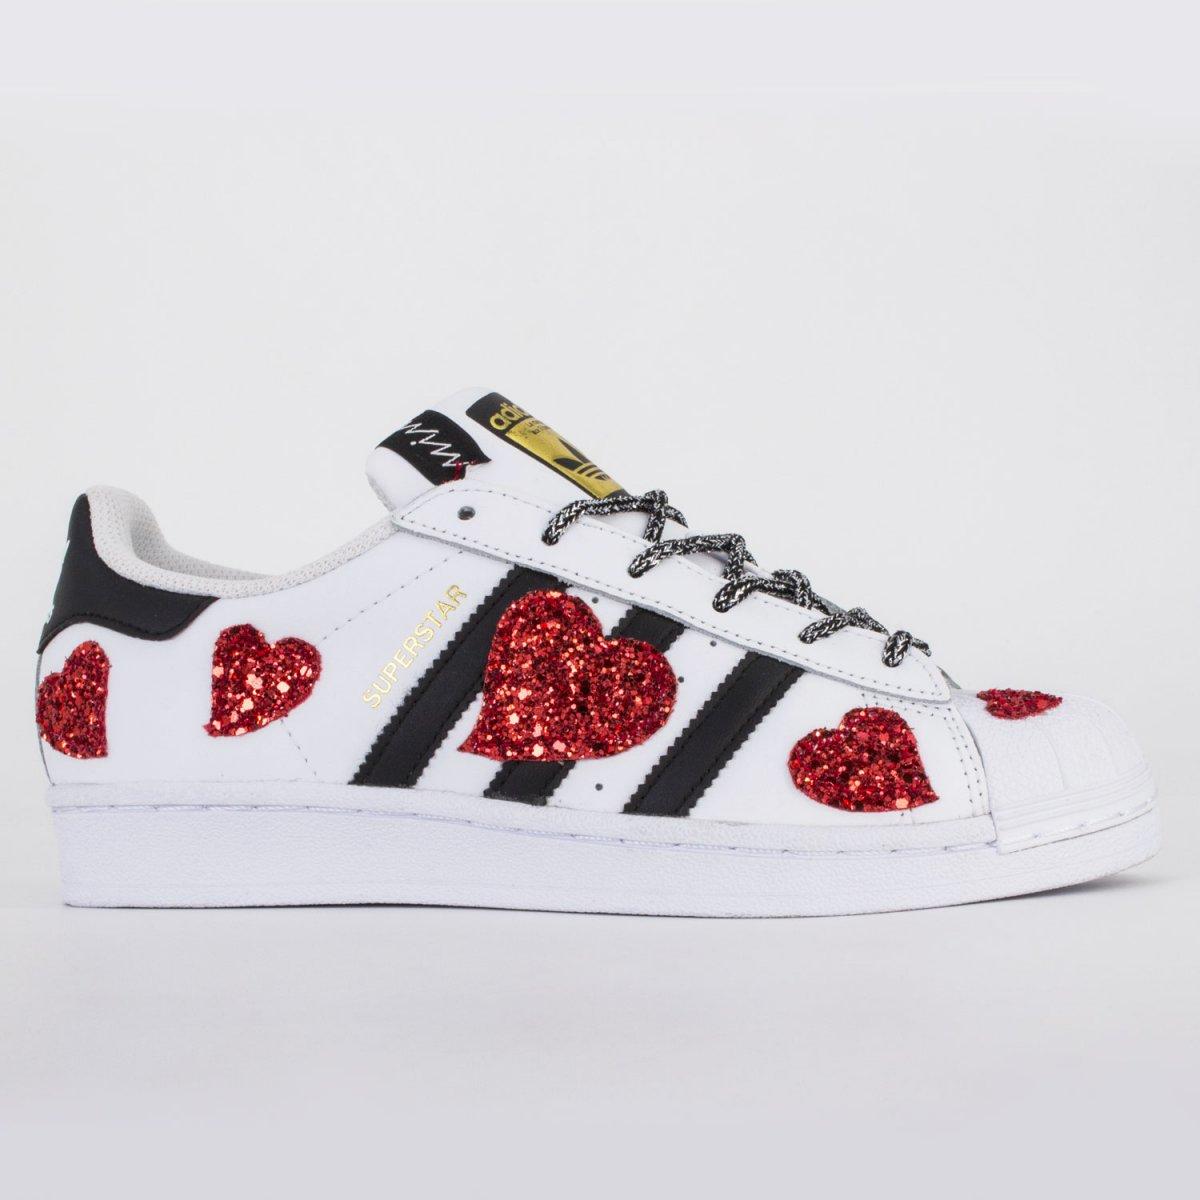 Adidas Superstar Love